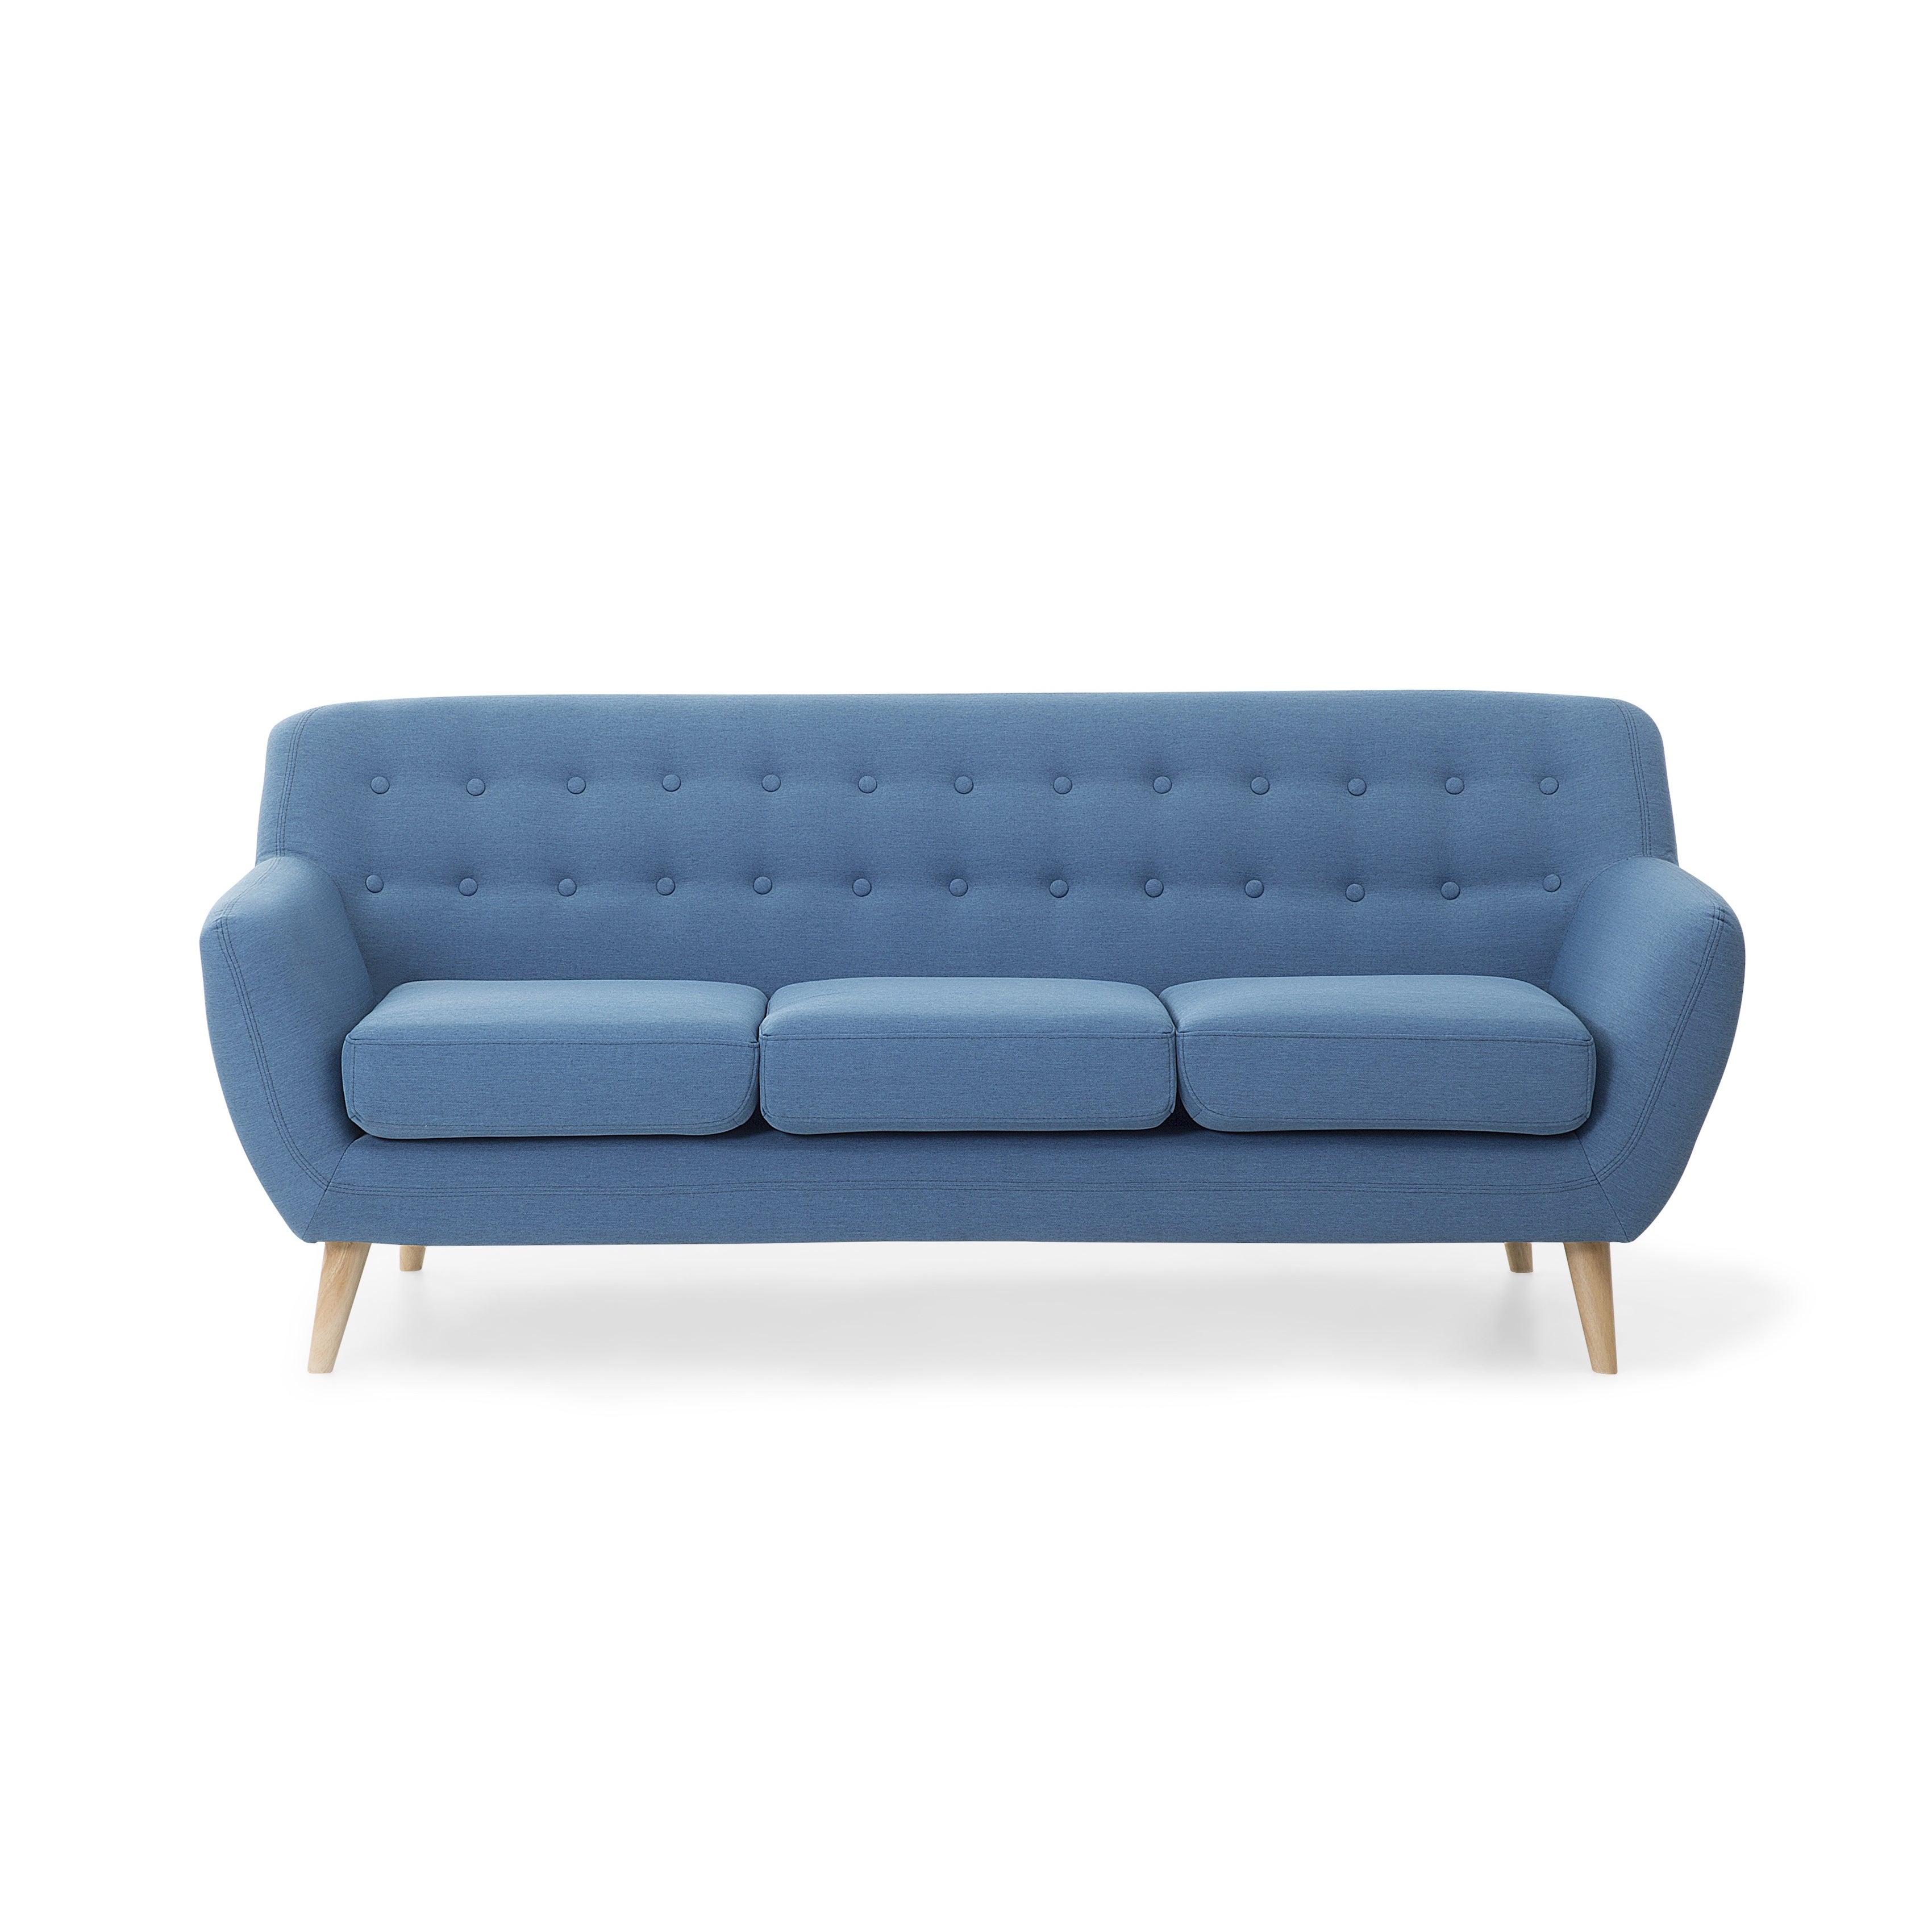 Mid Century Modern Tufted Sofa MODA